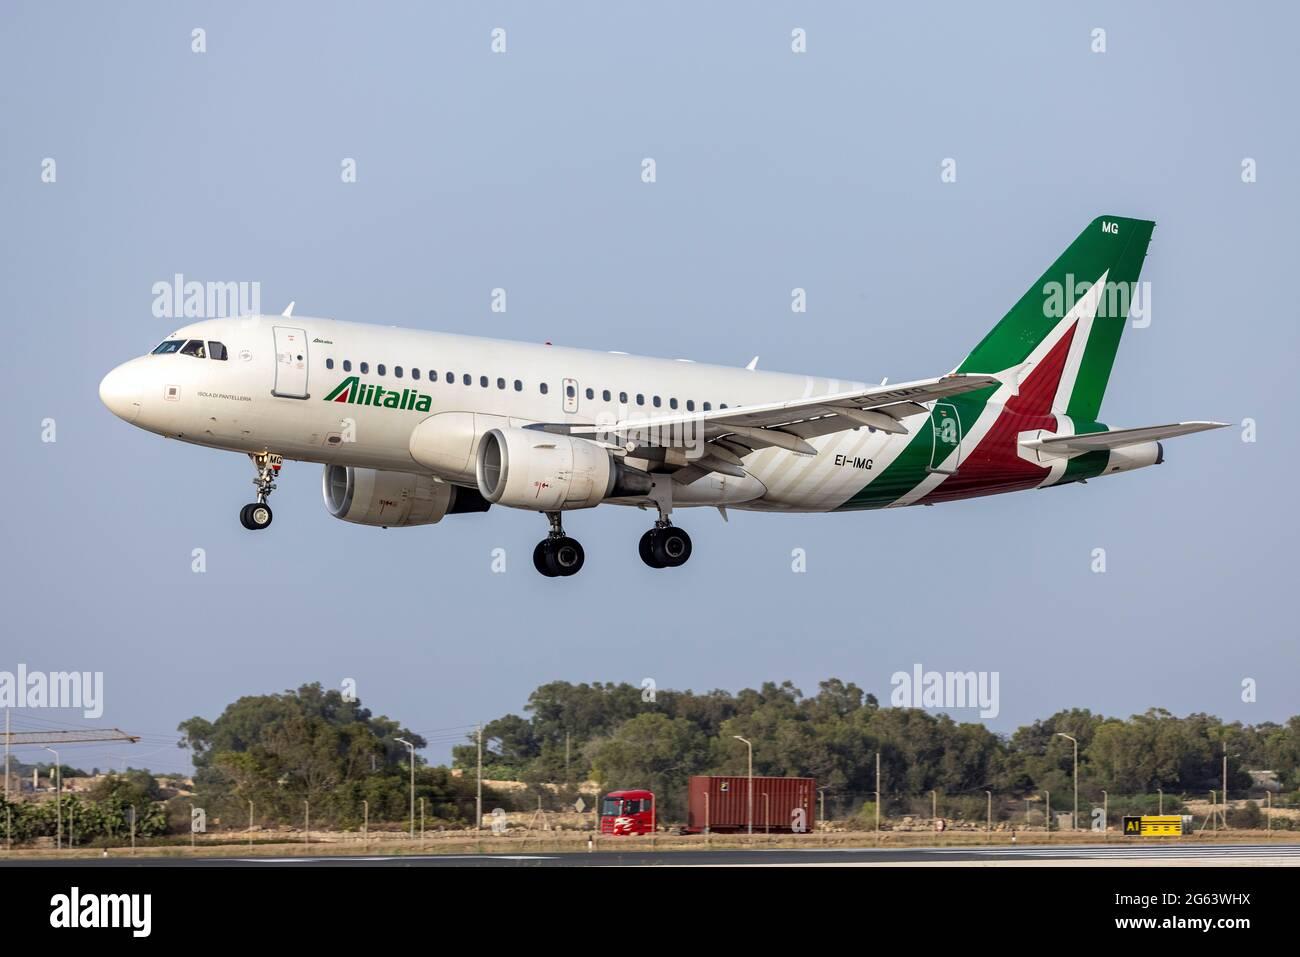 Alitalia Airbus A319-112 (REG: EI-IMG) completando su vuelo desde Roma, Italia. Foto de stock